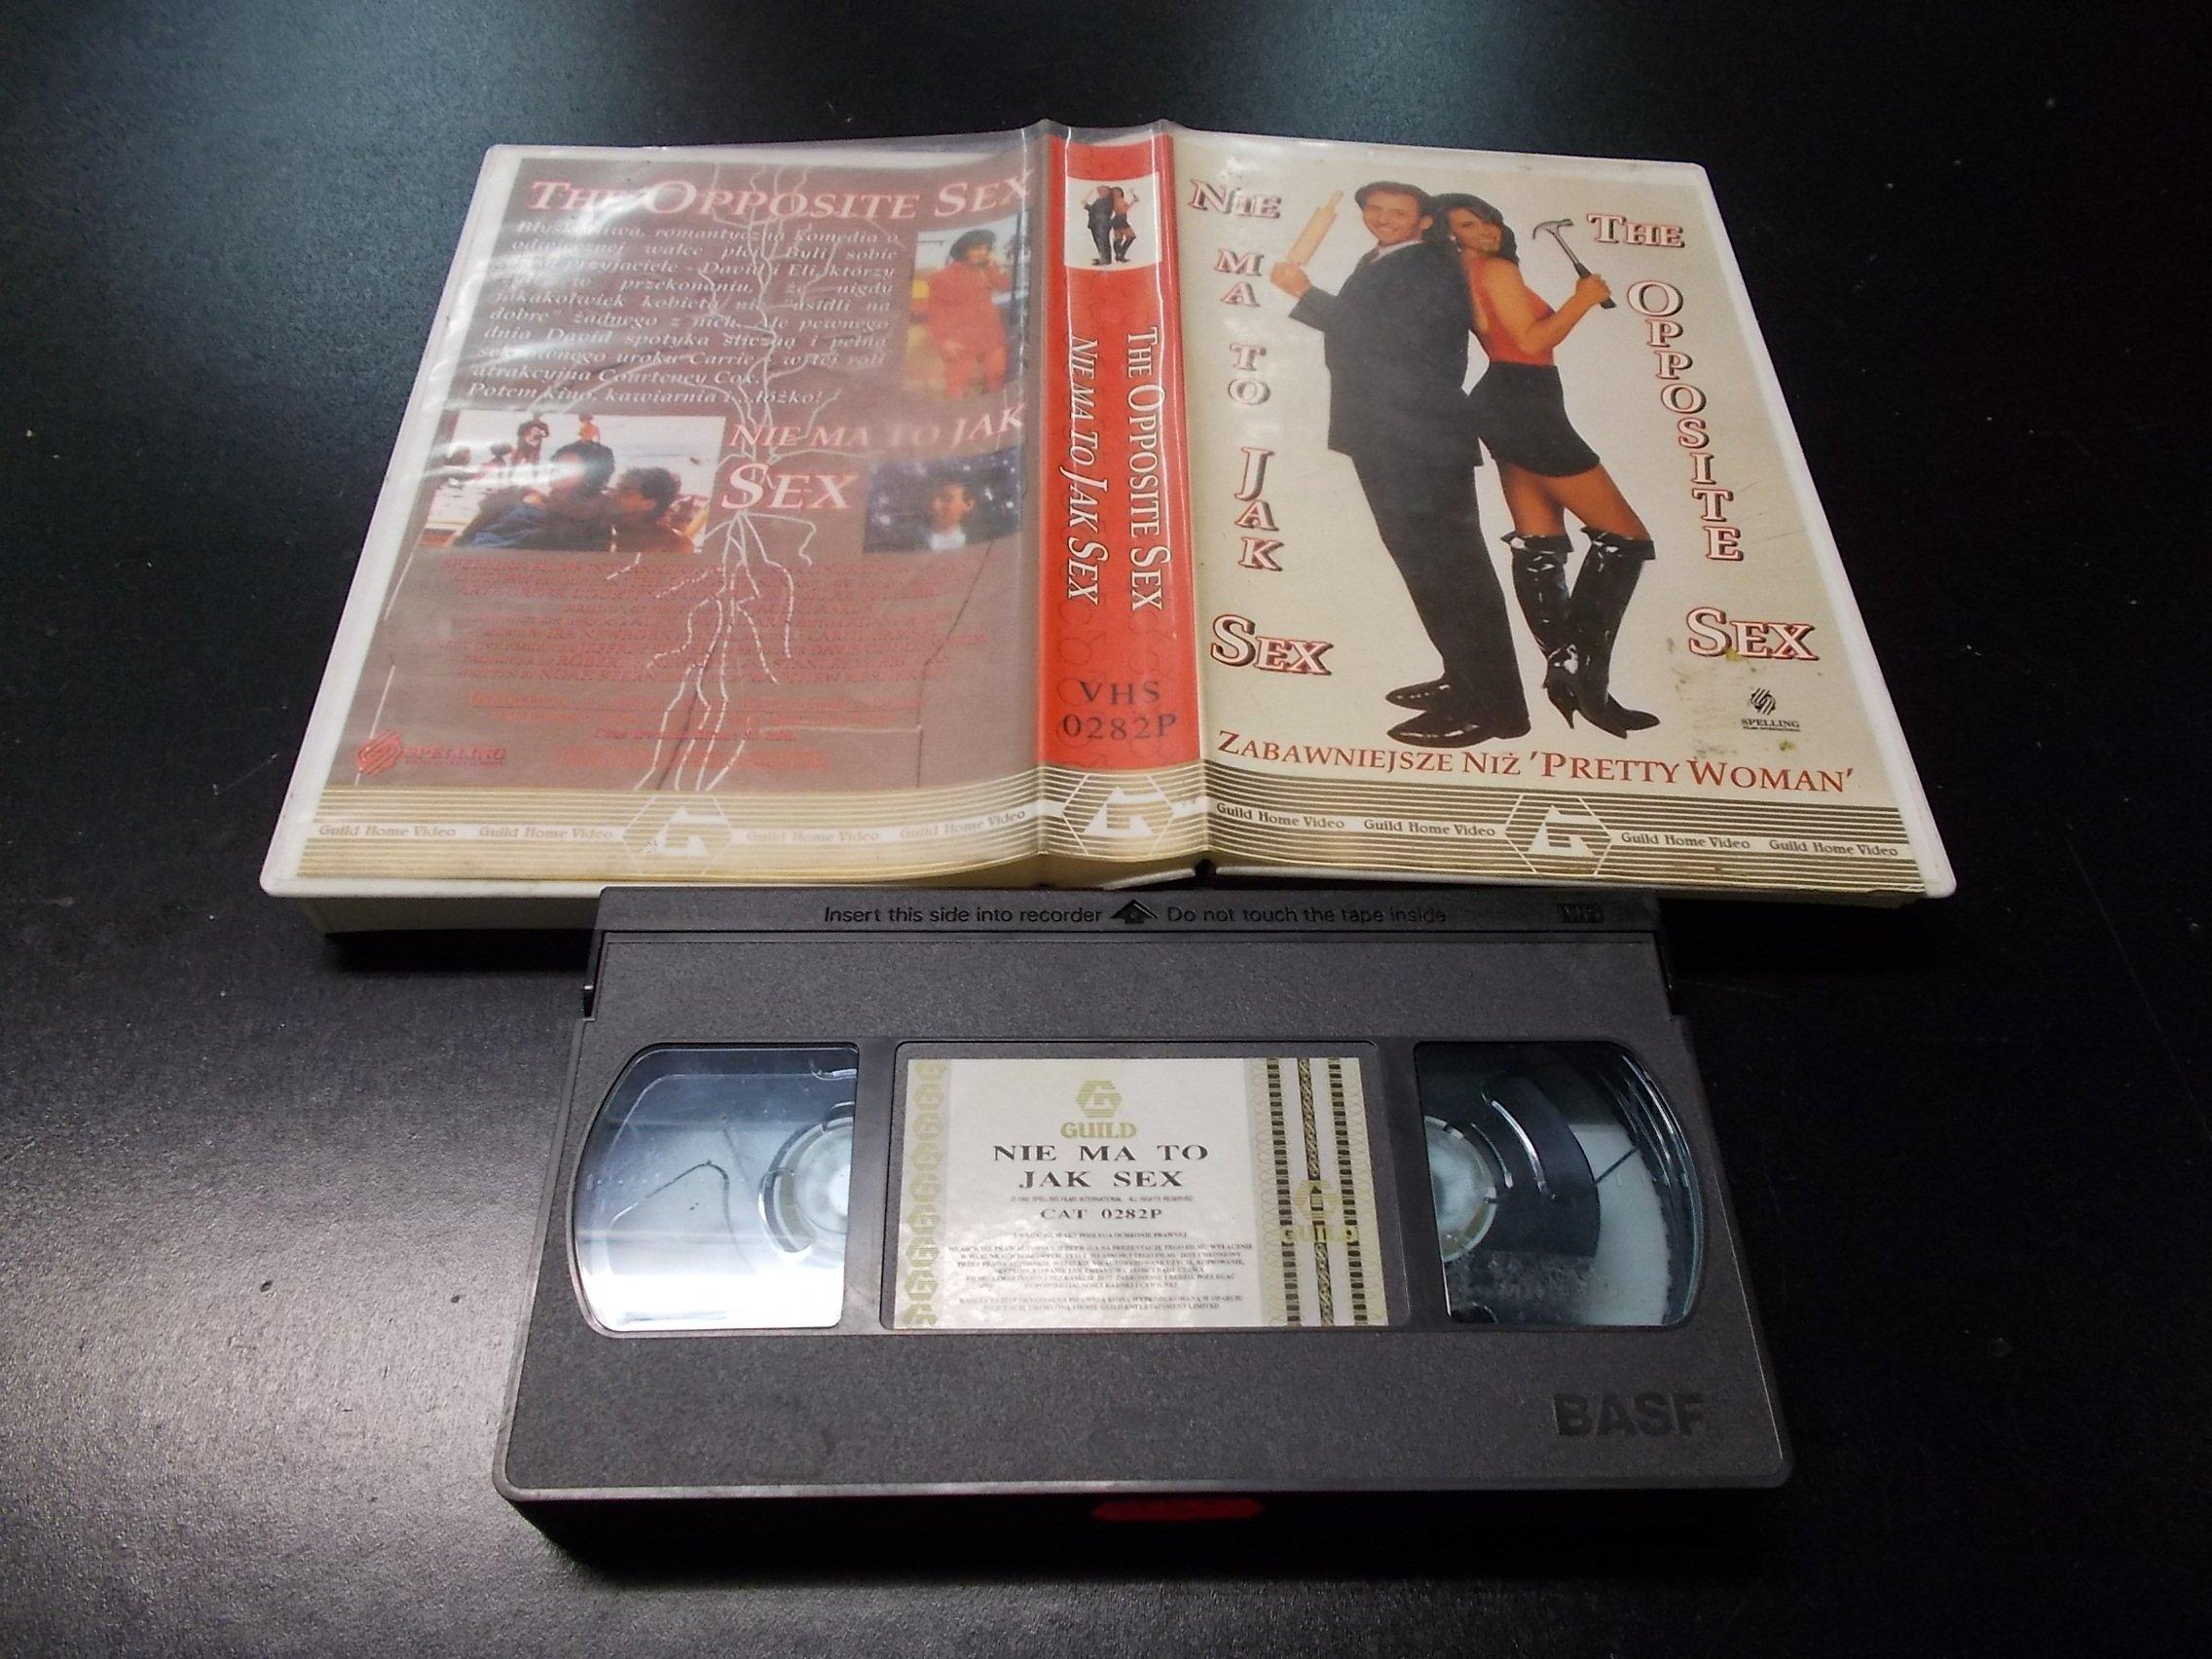 NIE MA TO JAK SEX -  kaseta Video VHS - 1334 Opole - AlleOpole.pl